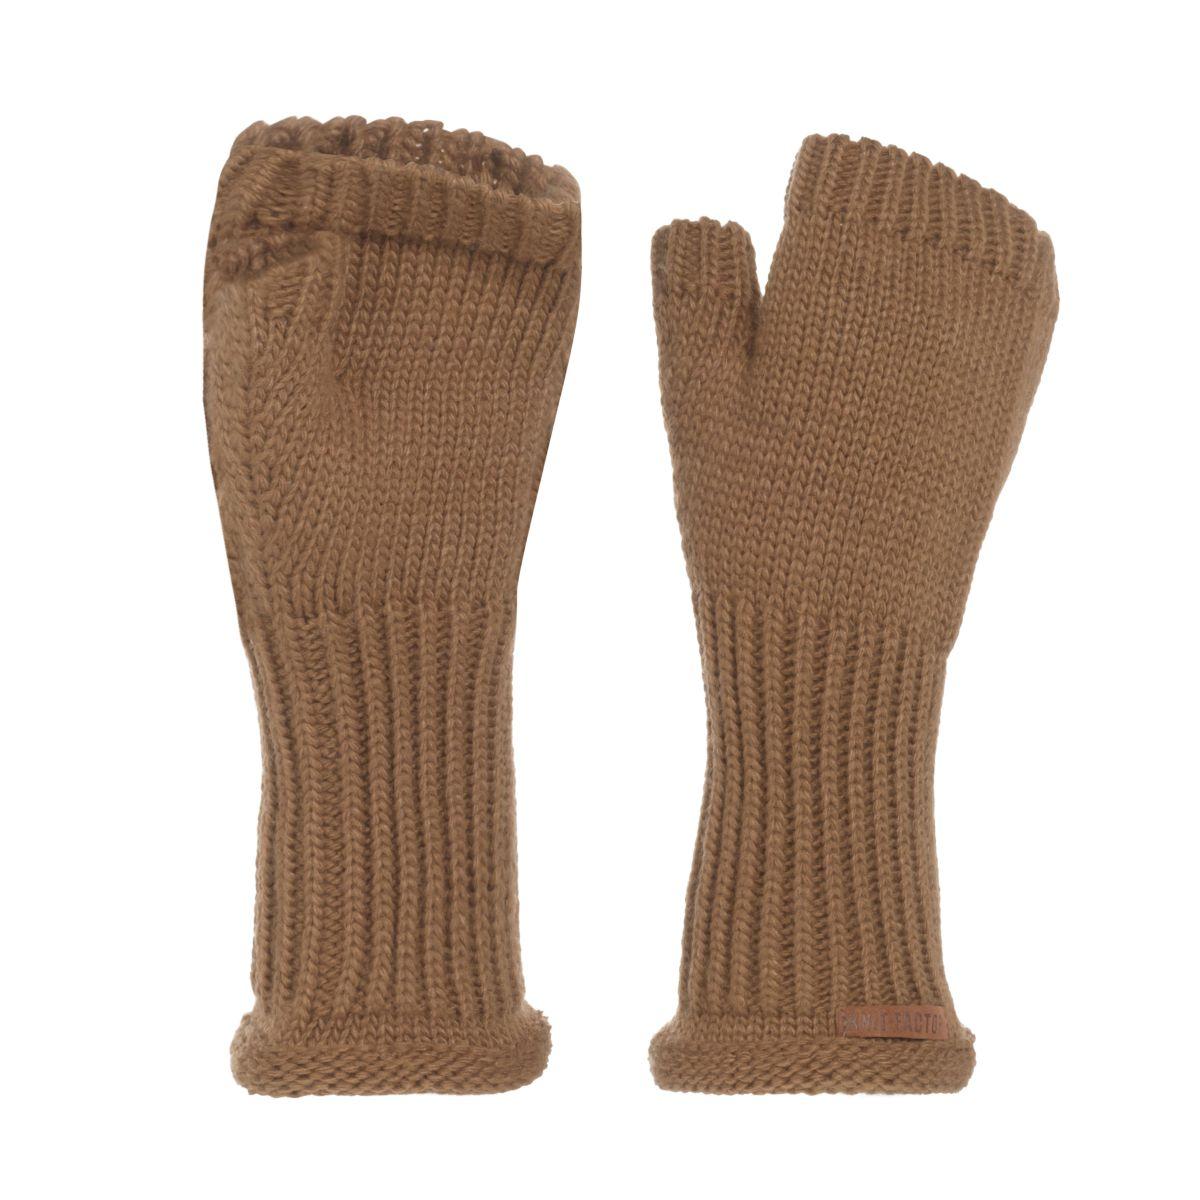 knit factory kf14607502050 cleo handschoenen new camel 1